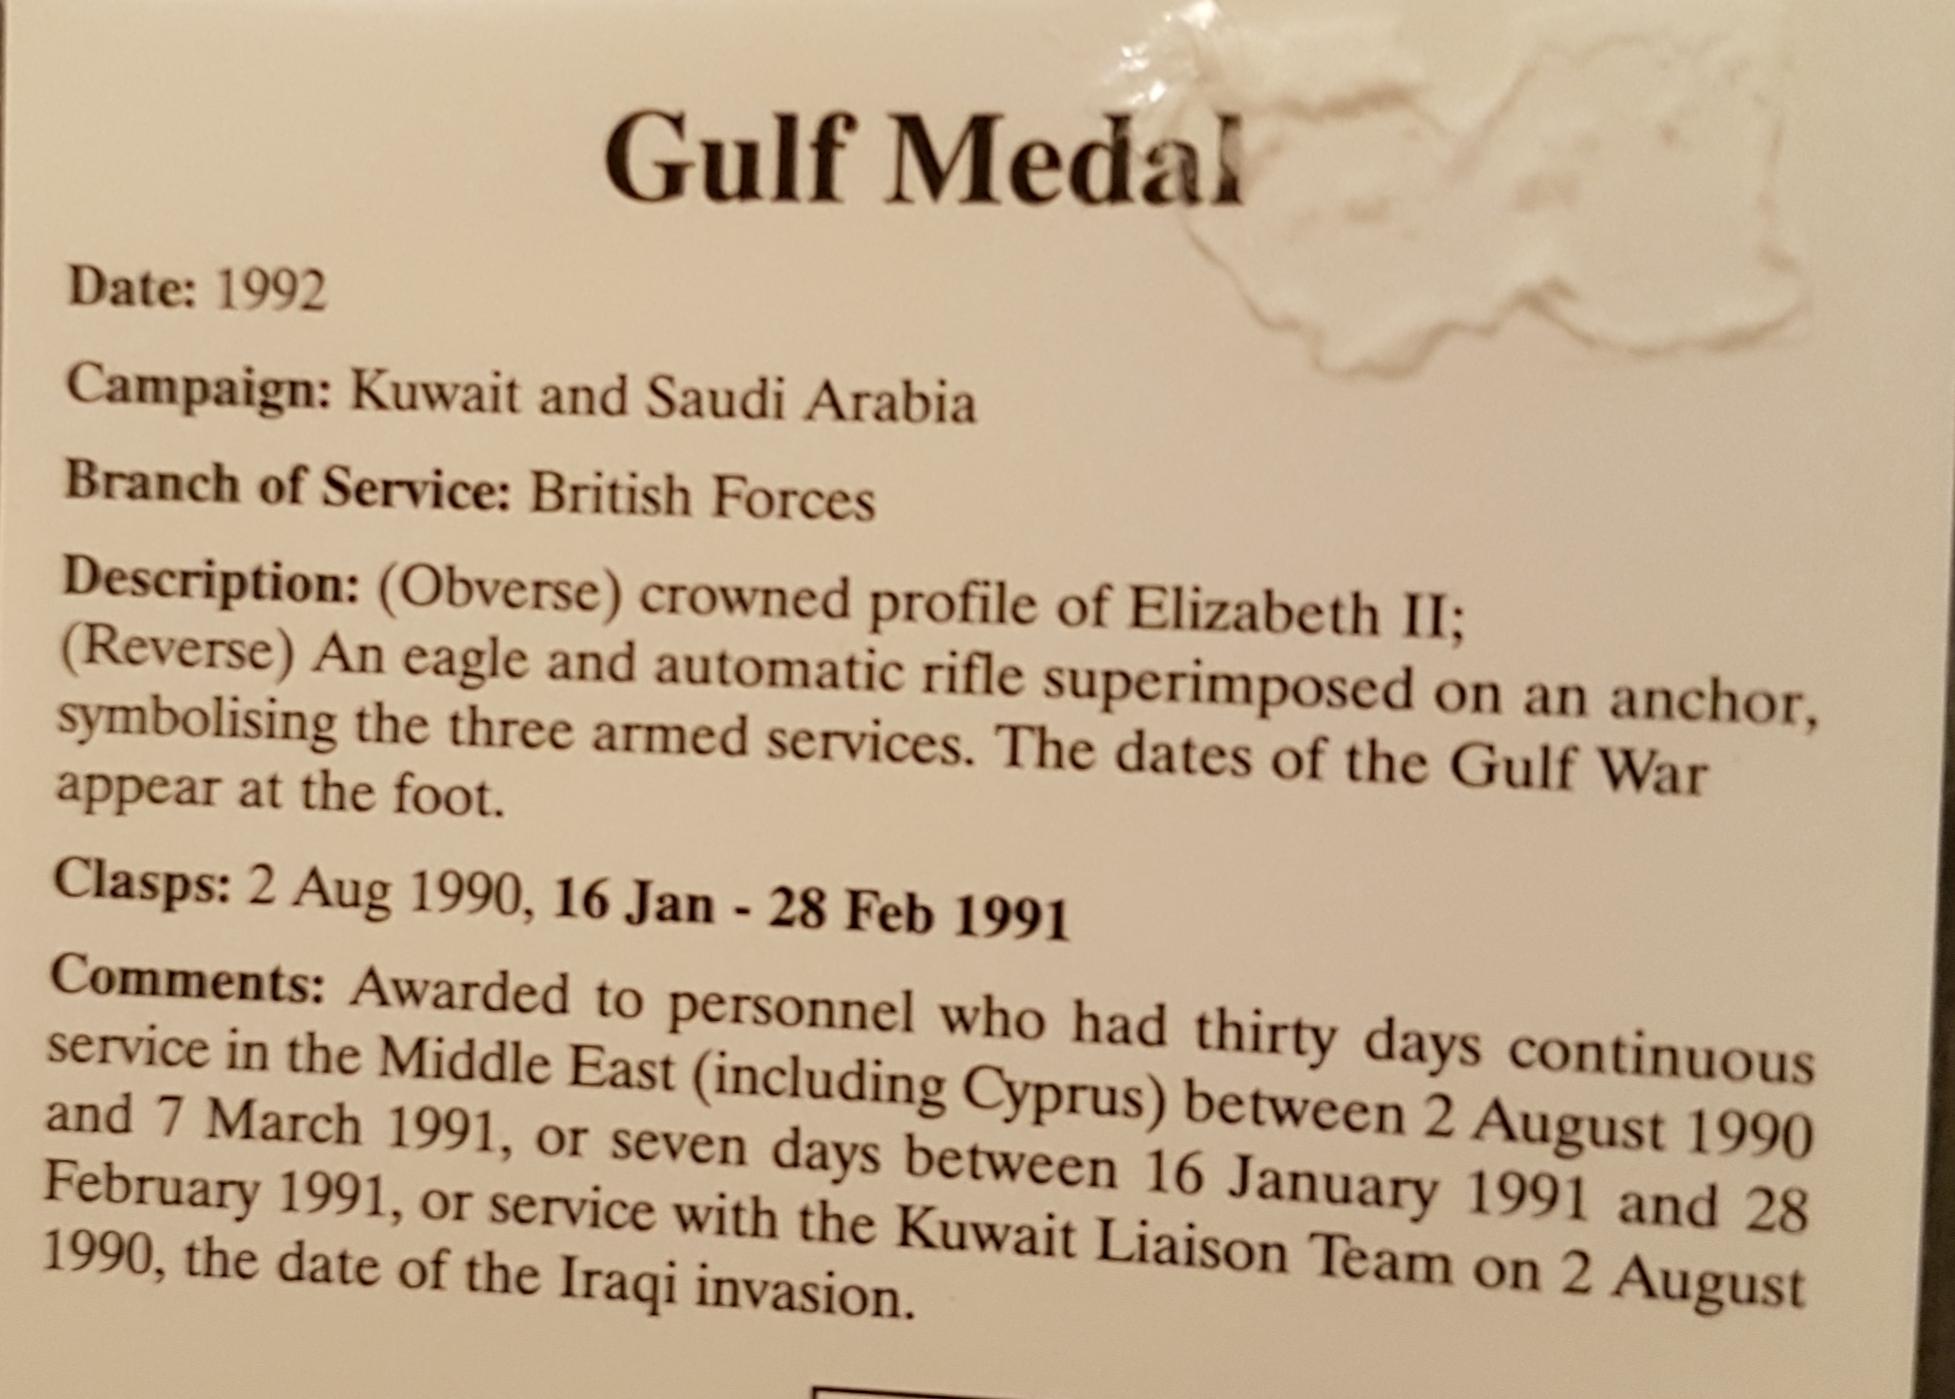 Gulf Medal - miniature